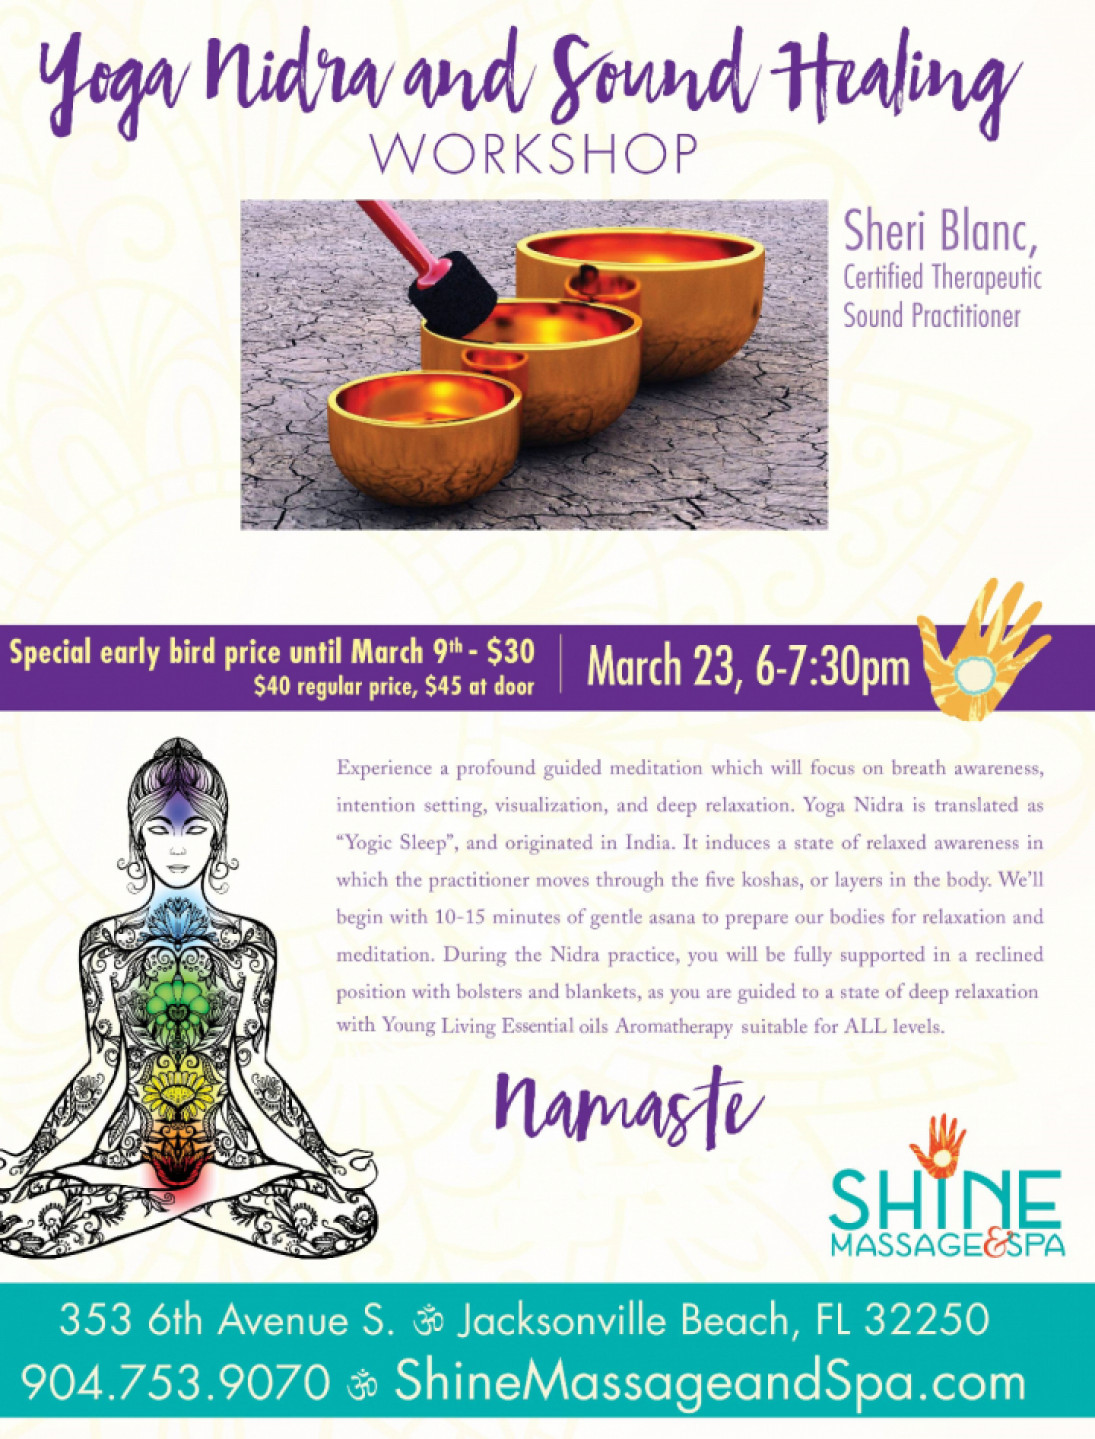 Yoga Nidra Sound Healing Workshop